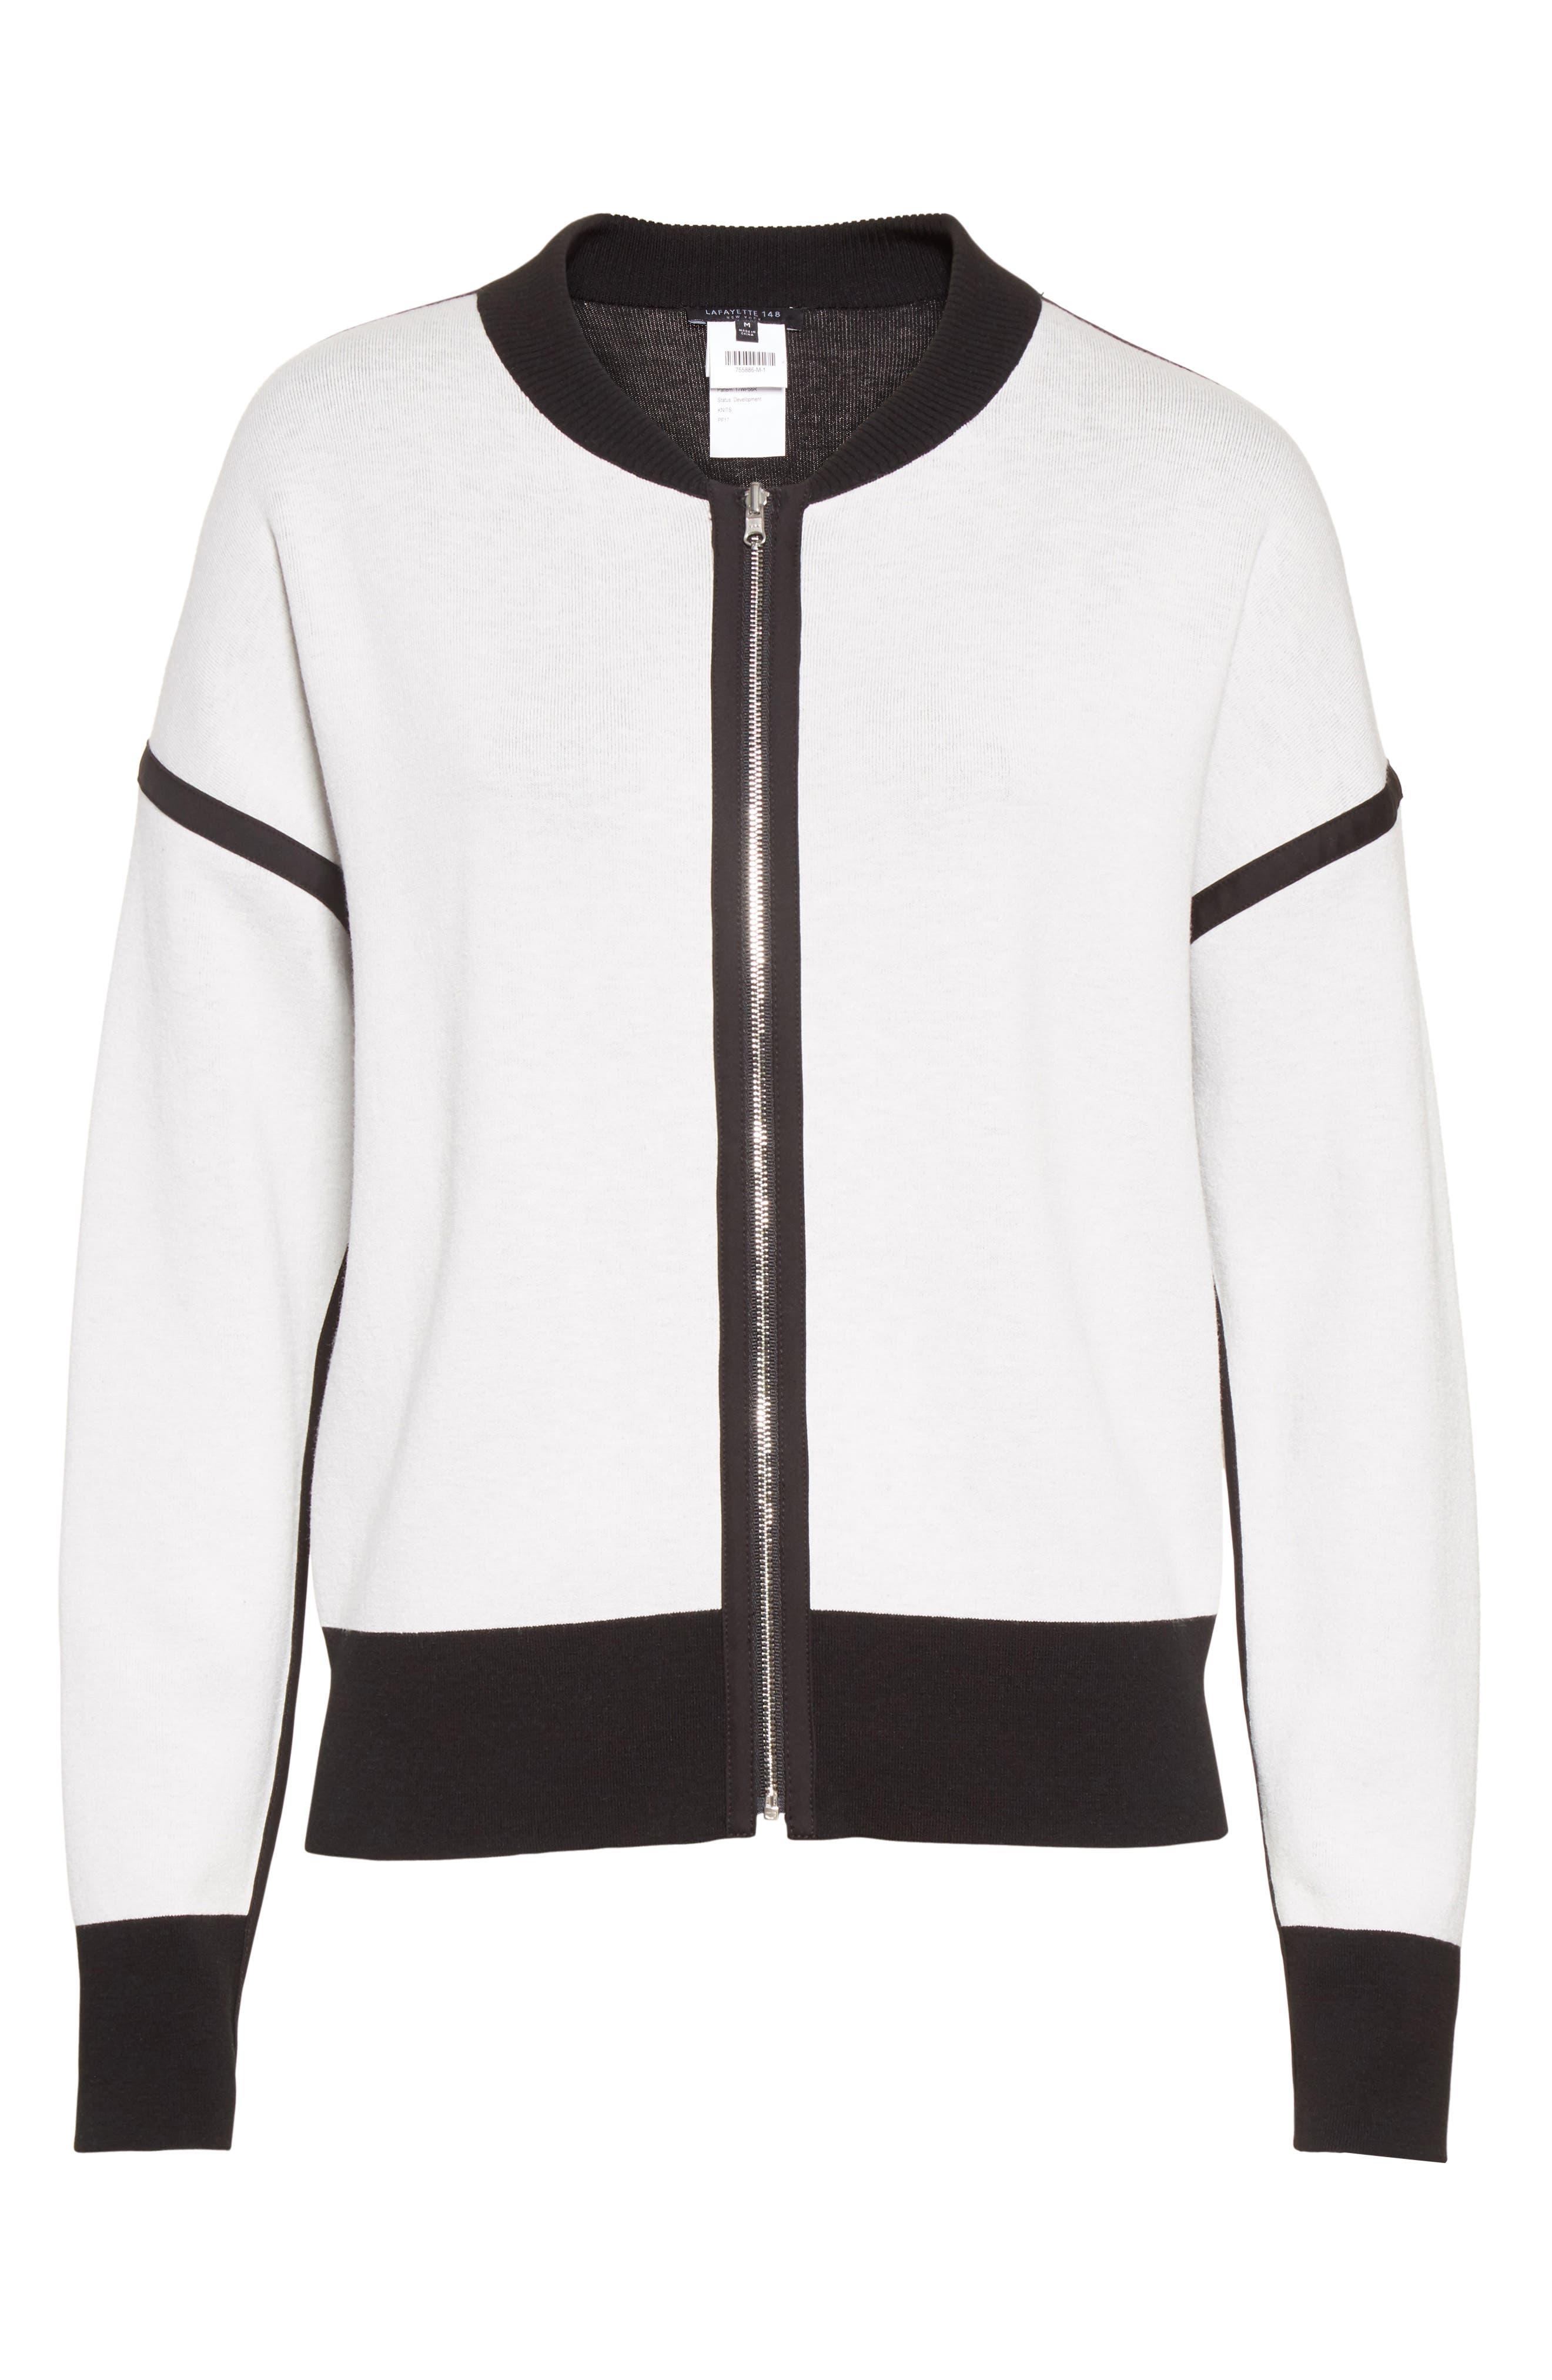 Matte Crepe Reversible Knit Bomber Jacket,                             Alternate thumbnail 6, color,                             Cloud / Black